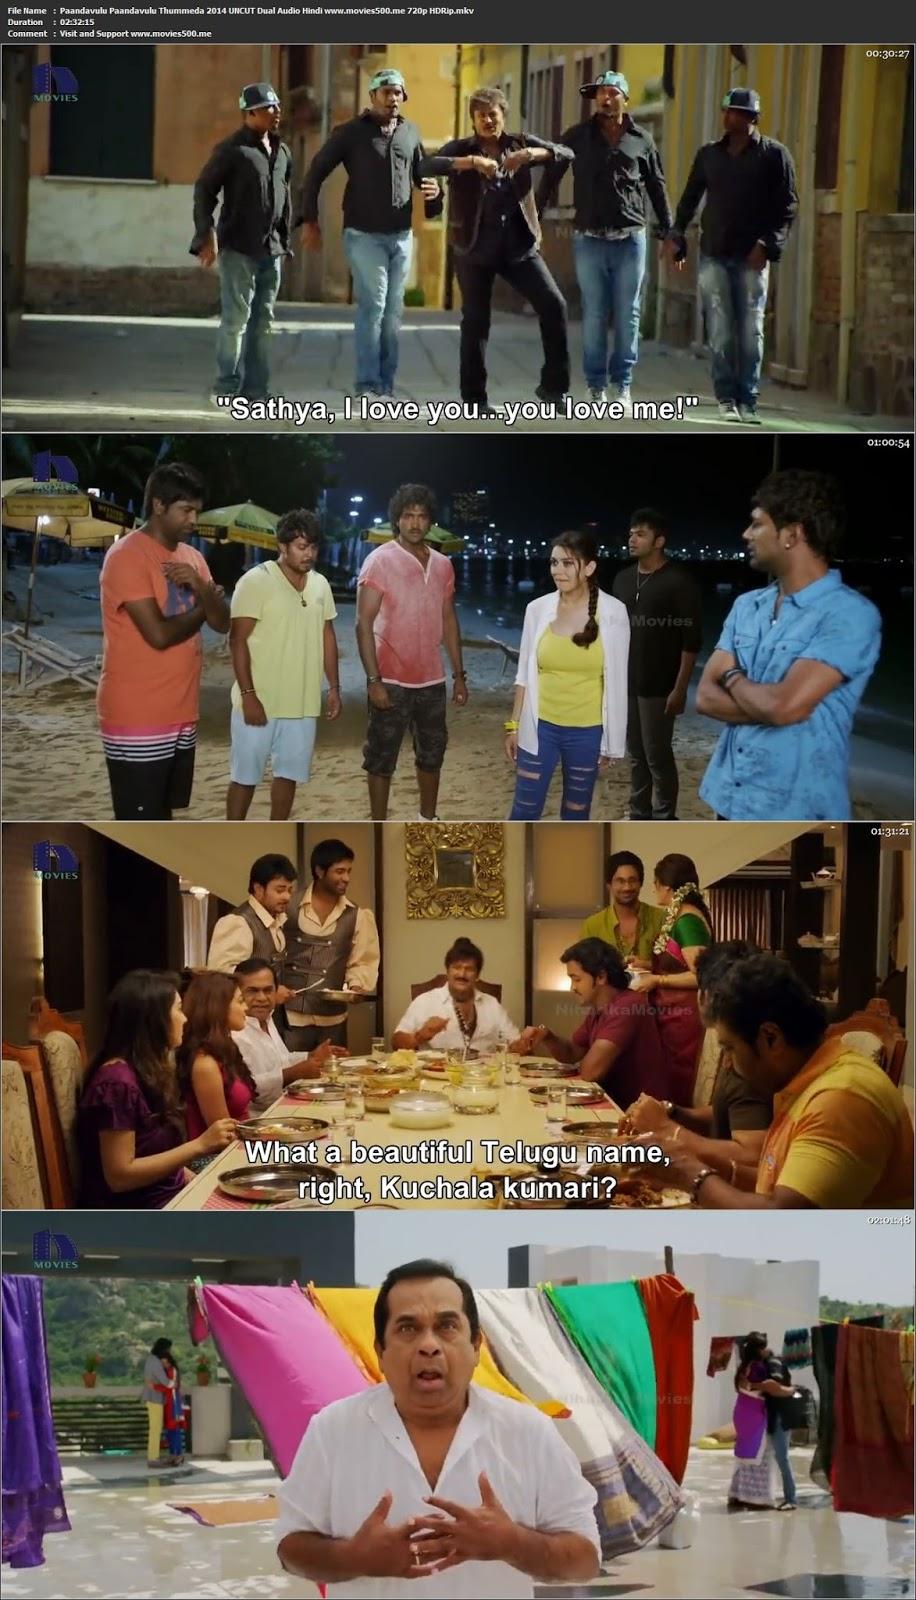 Paandavulu Paandavulu Thummeda 2014 UNCUT Dual Audio Hindi HDRip 720p at movies500.me